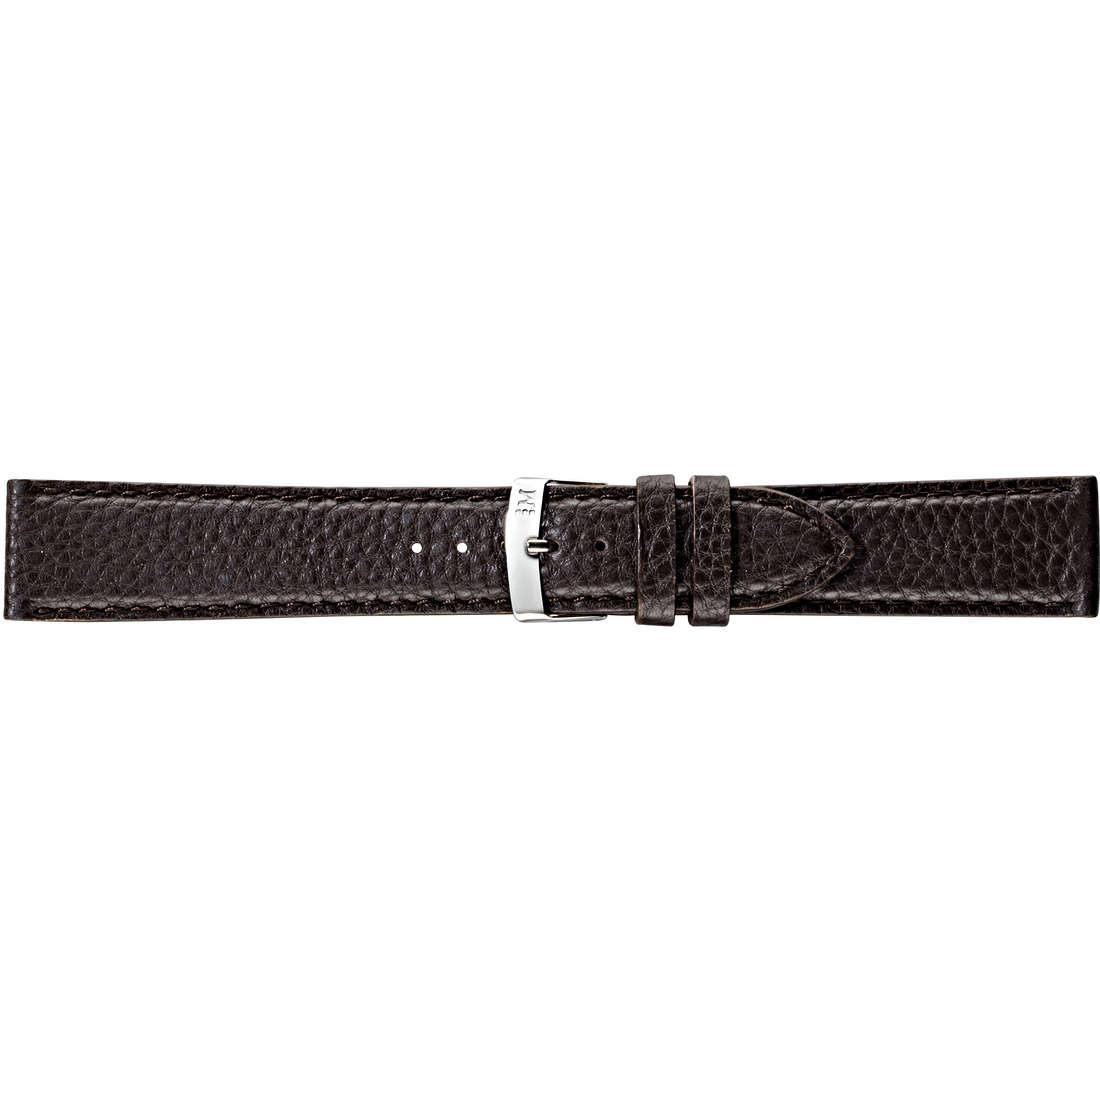 watch watch bands watch straps man Morellato Performance A01X4596B61032CR20